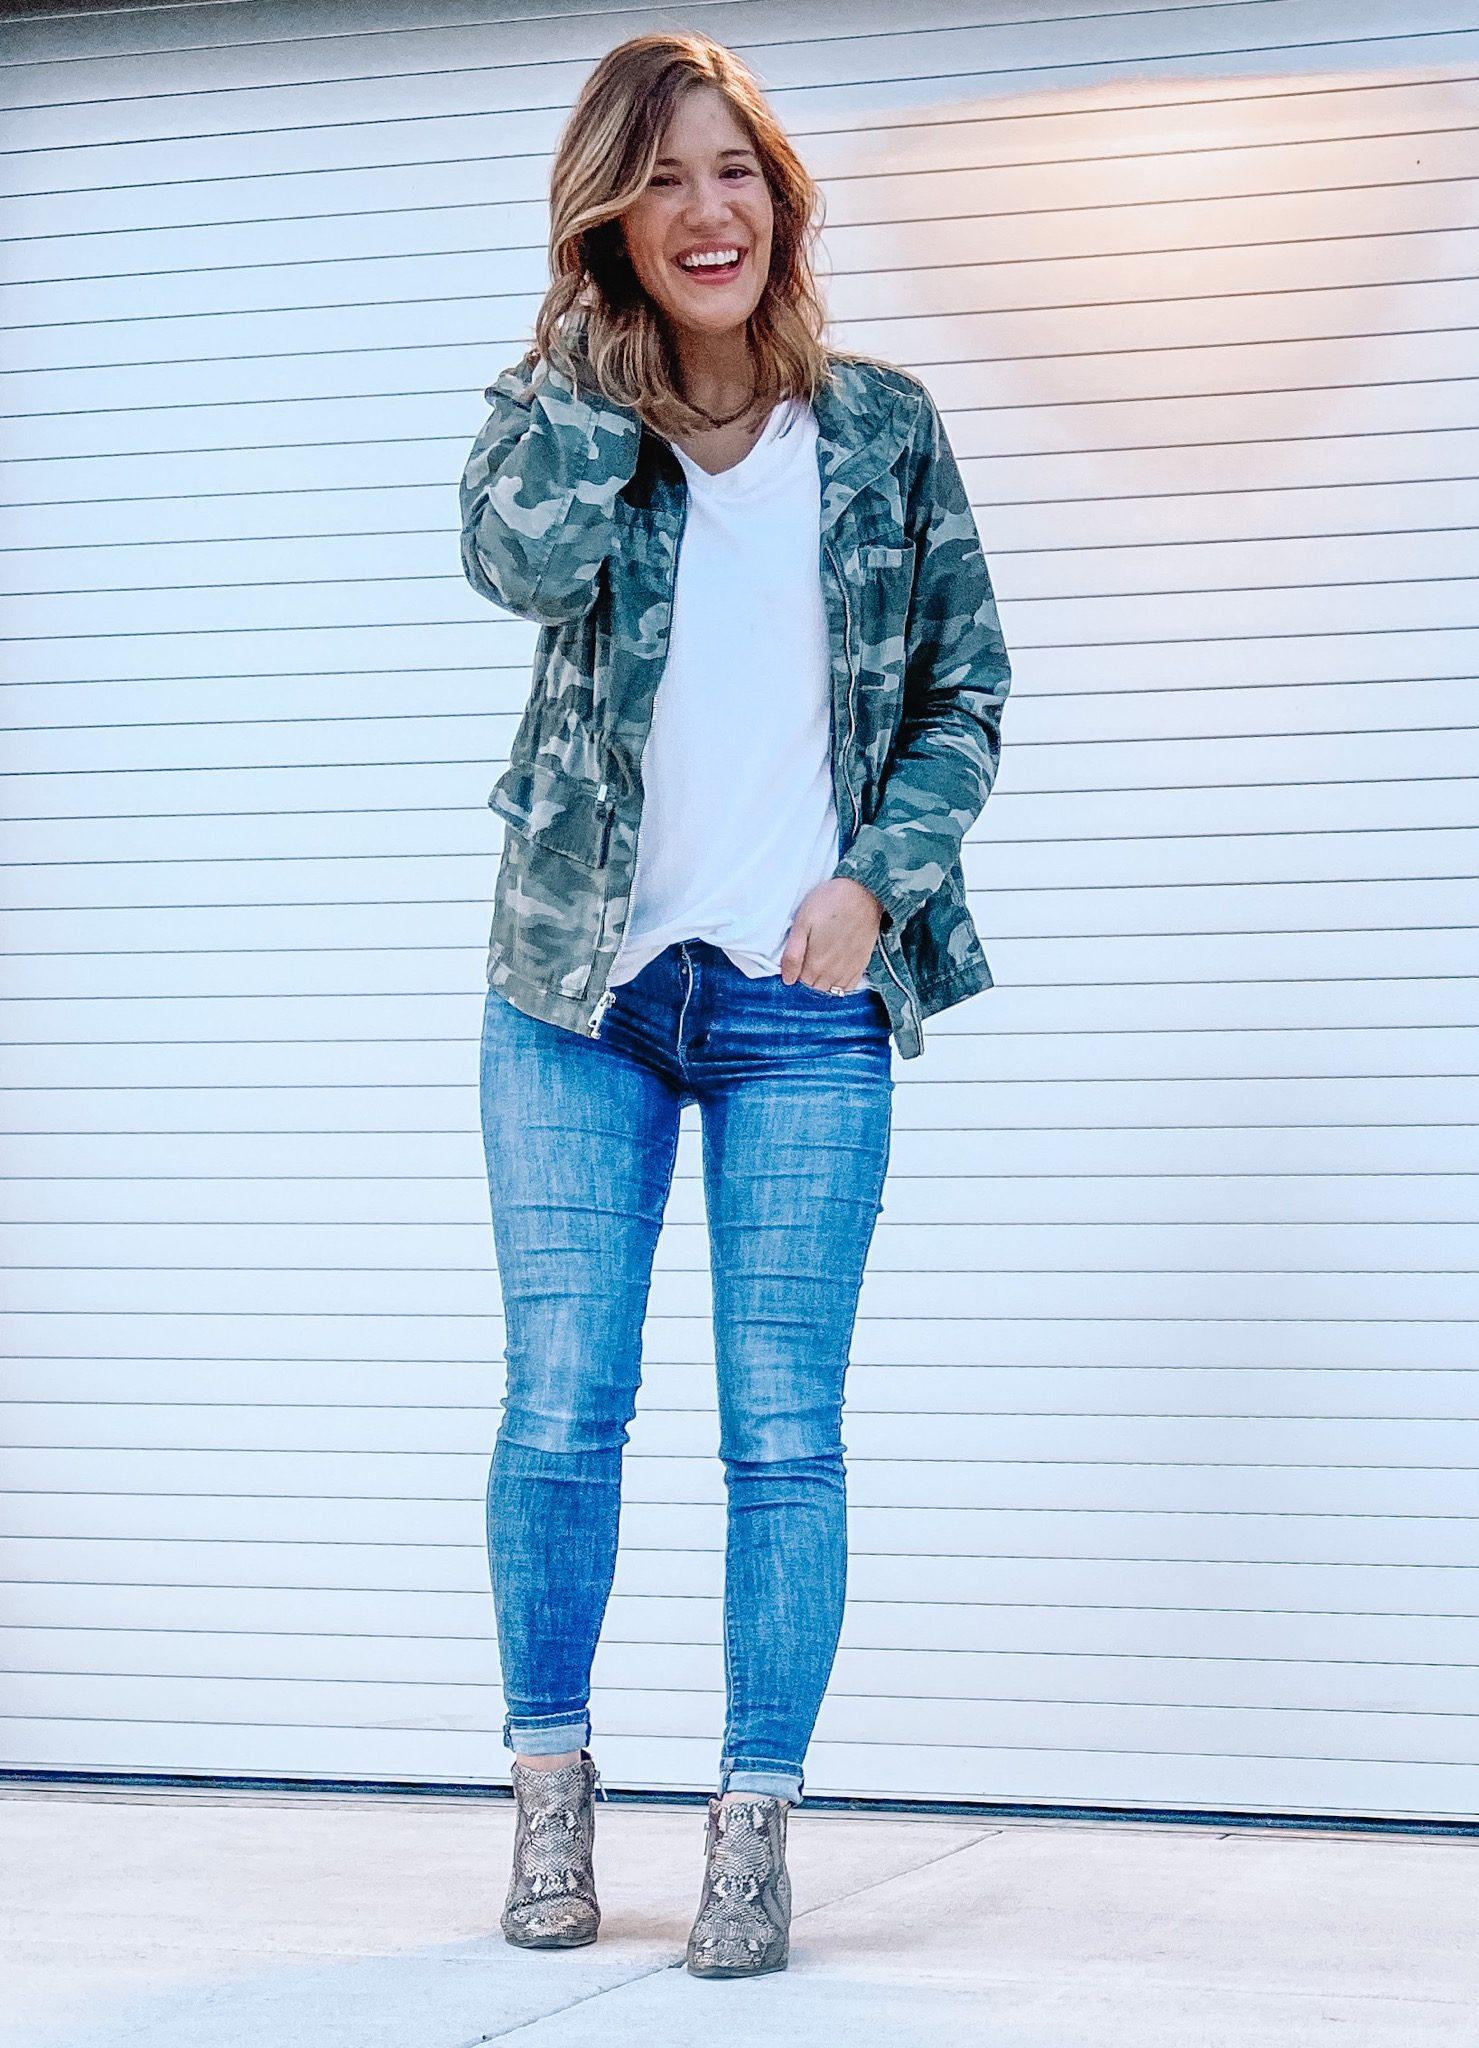 camo utility jacket snakeskin booties white v neck t shirt dark wash jeans